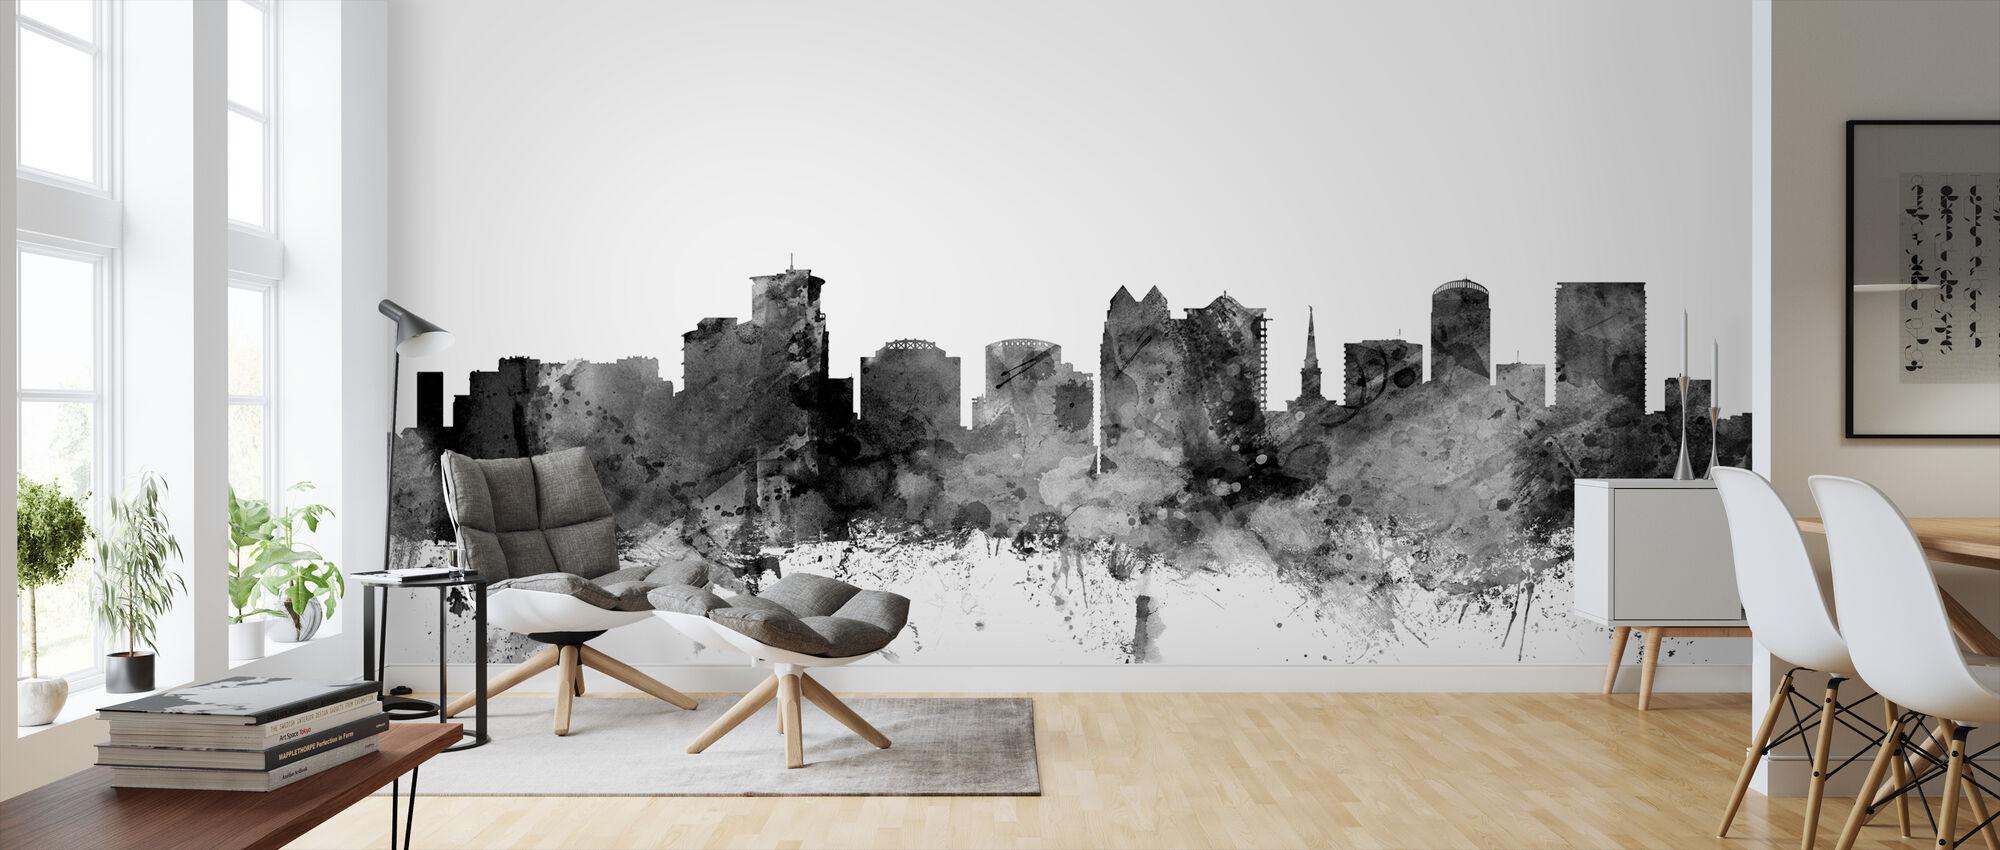 Orlando Florida Skyline Black - Wallpaper - Living Room